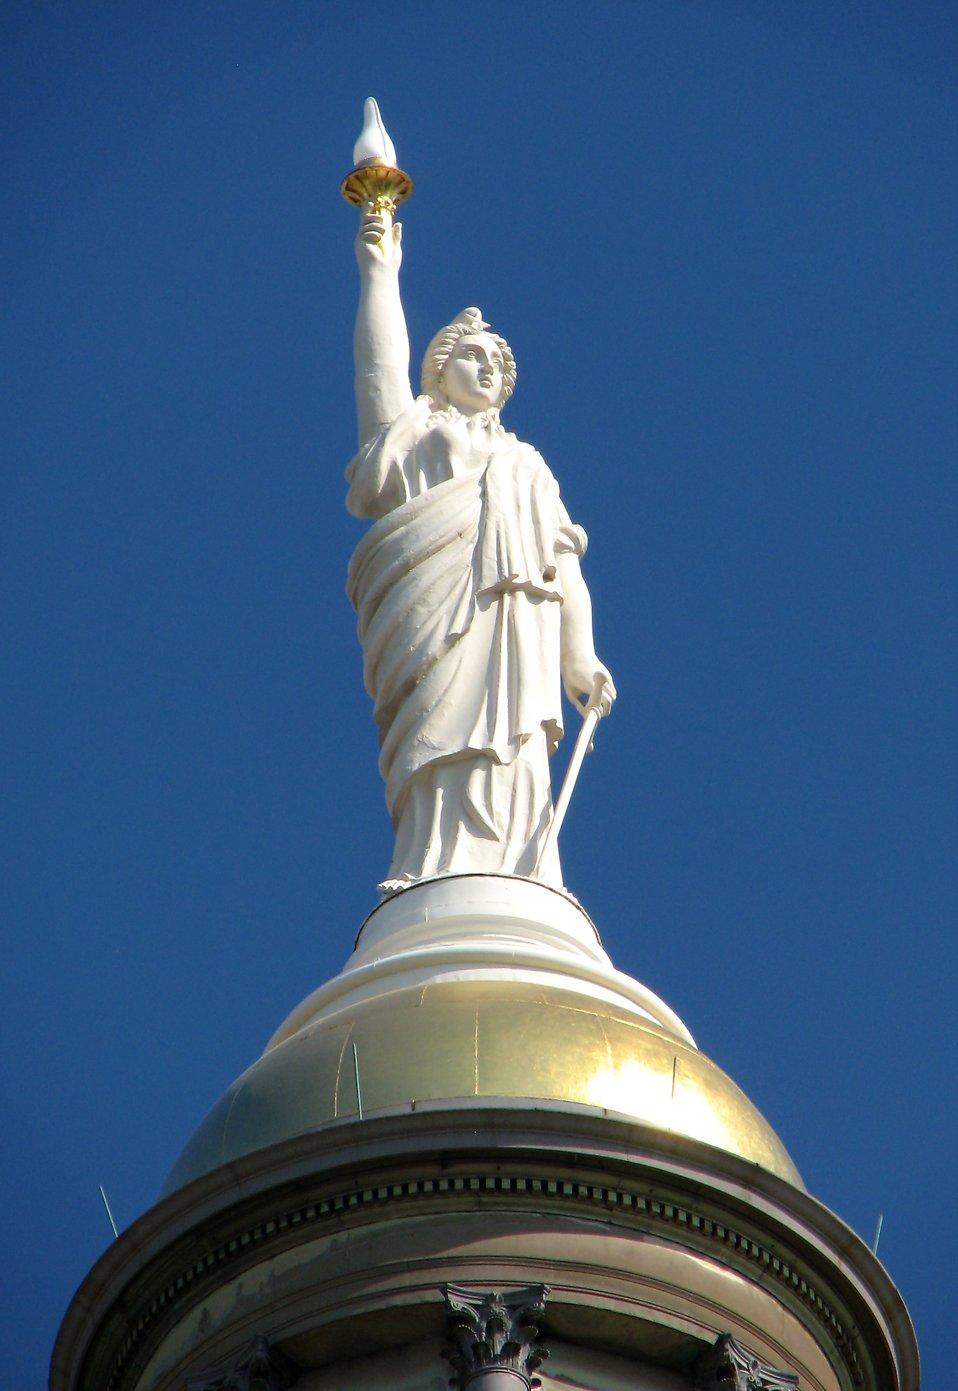 A statue on top of the Georgia State Capitol building in Atlanta, Georgia : Free Stock Photo